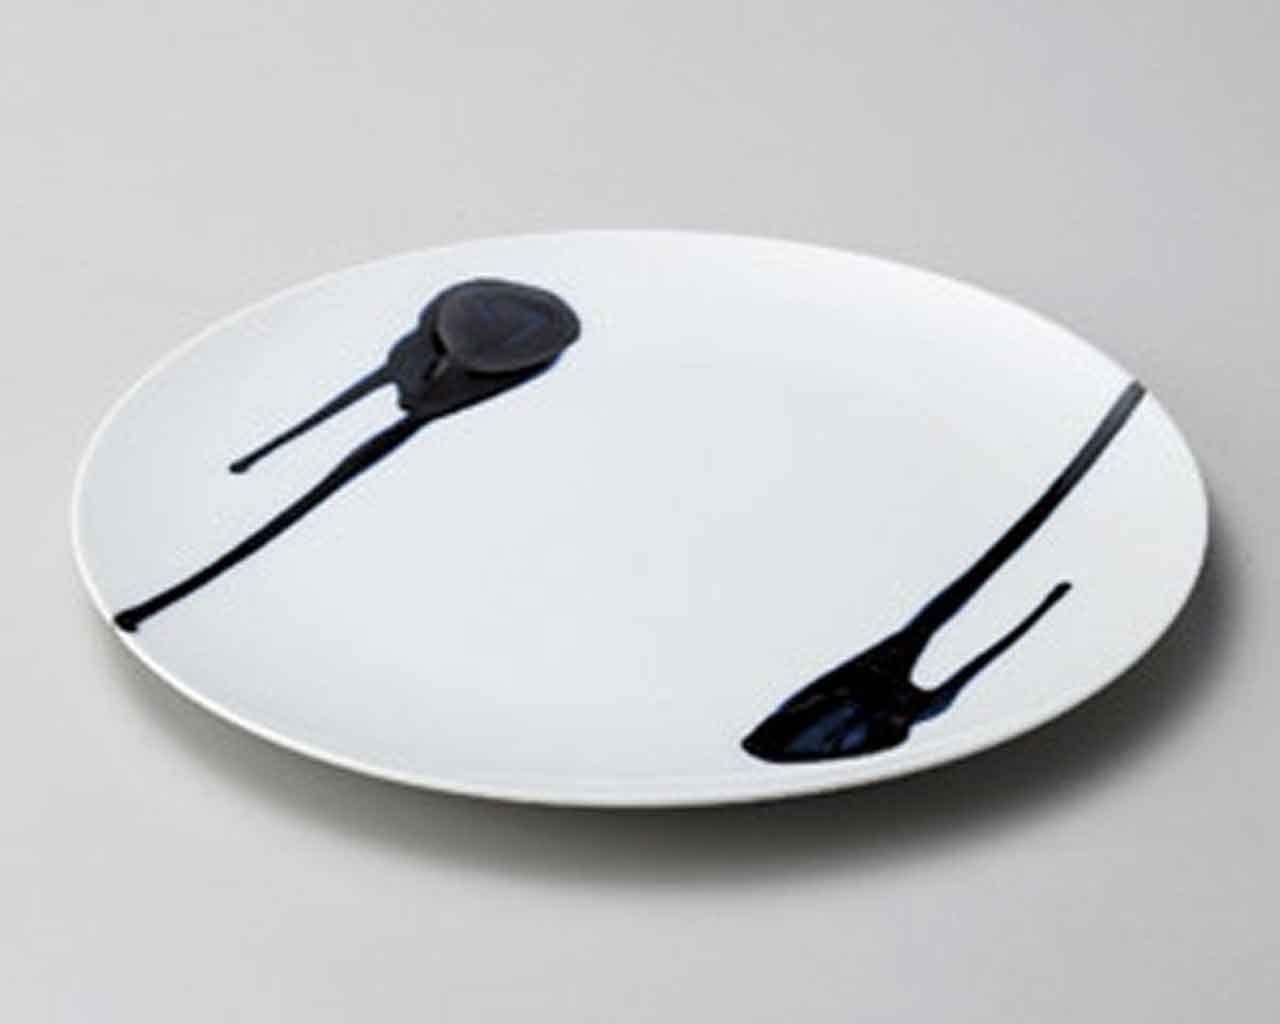 Gosu Nagashi 9.1inch SUSHI PLATE White porcelain Made in Japan